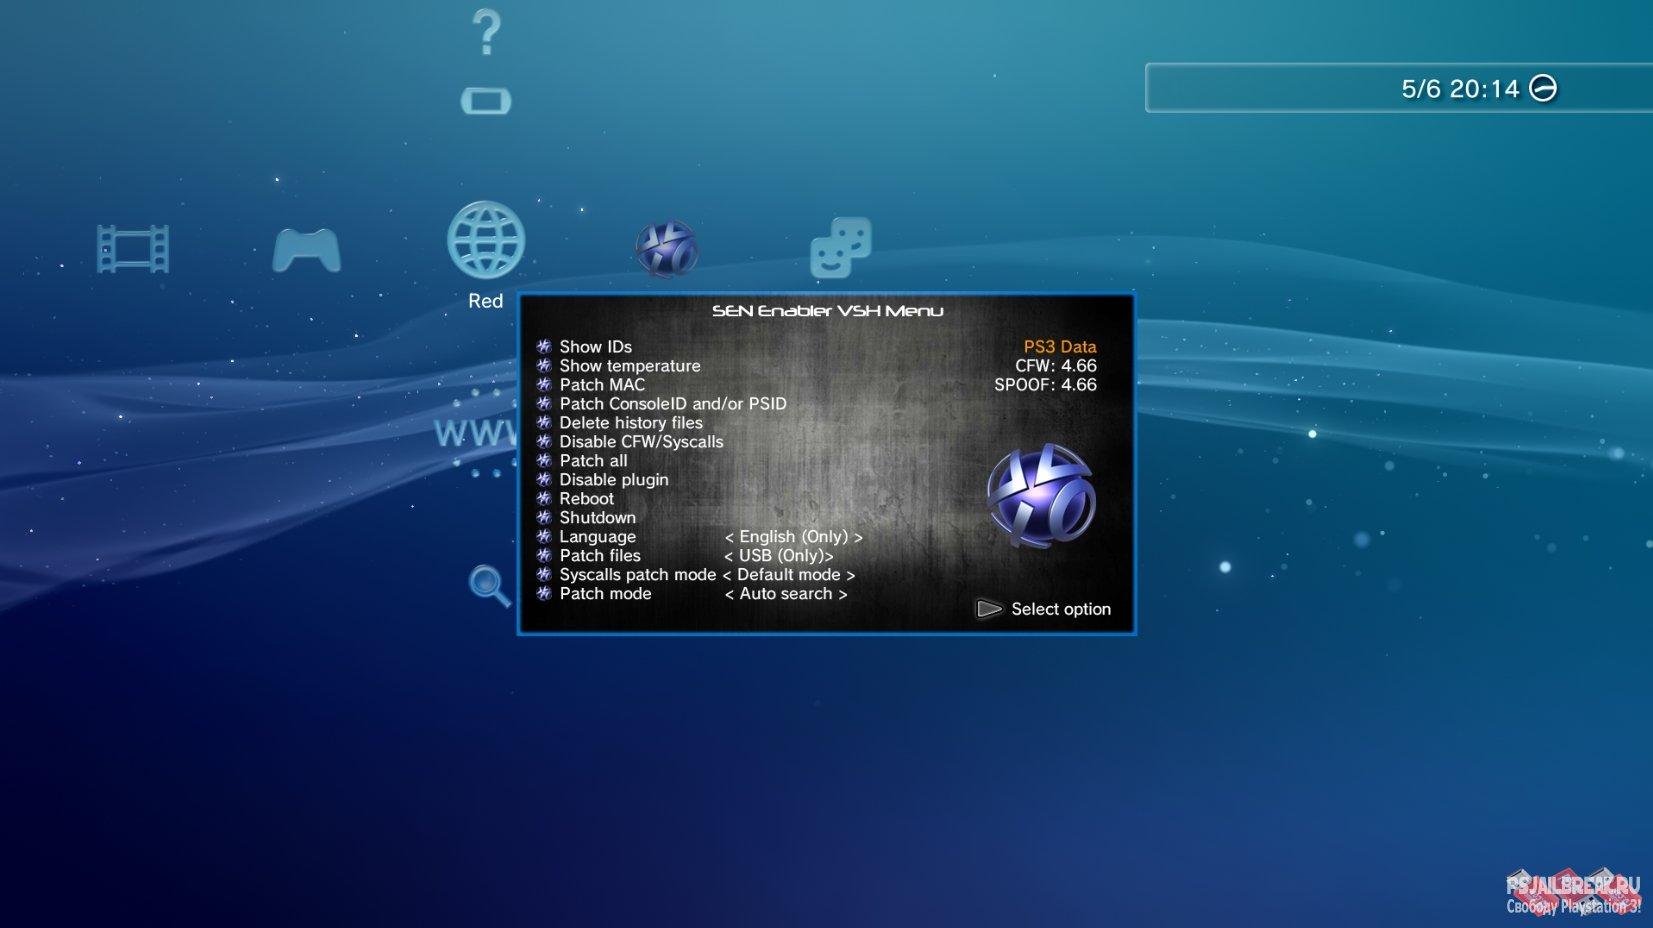 Darknet ps3 скачать тор браузер хакеры hydra2web